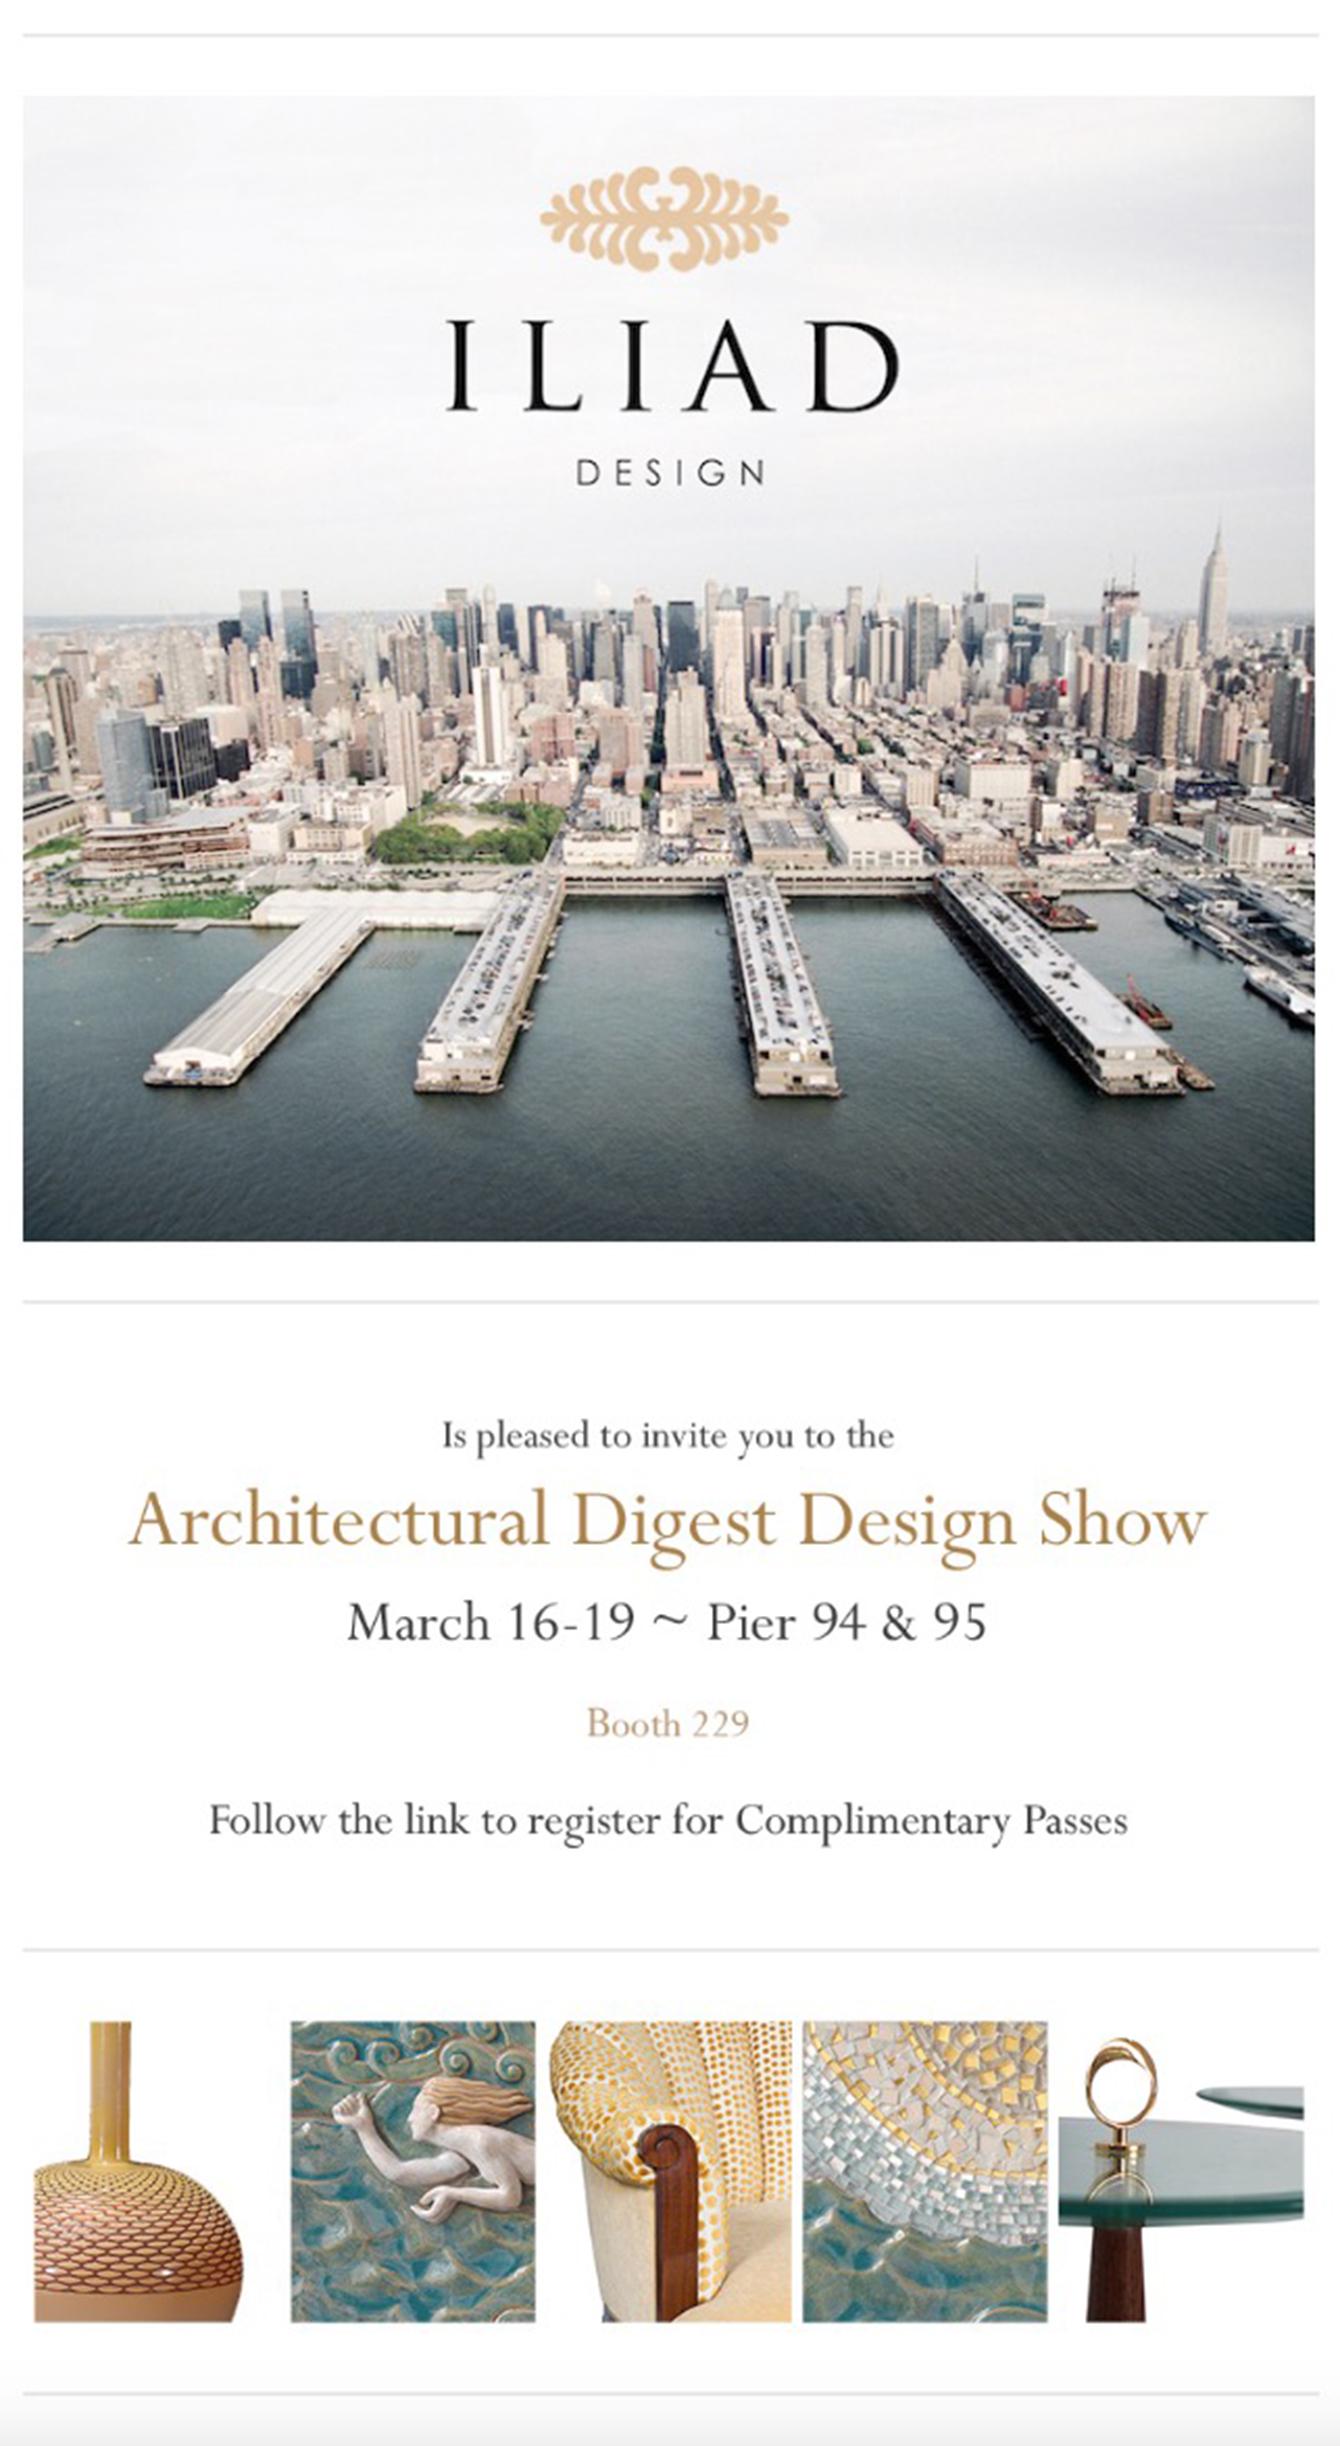 Architectural digest design show iliad for Architectural digest show